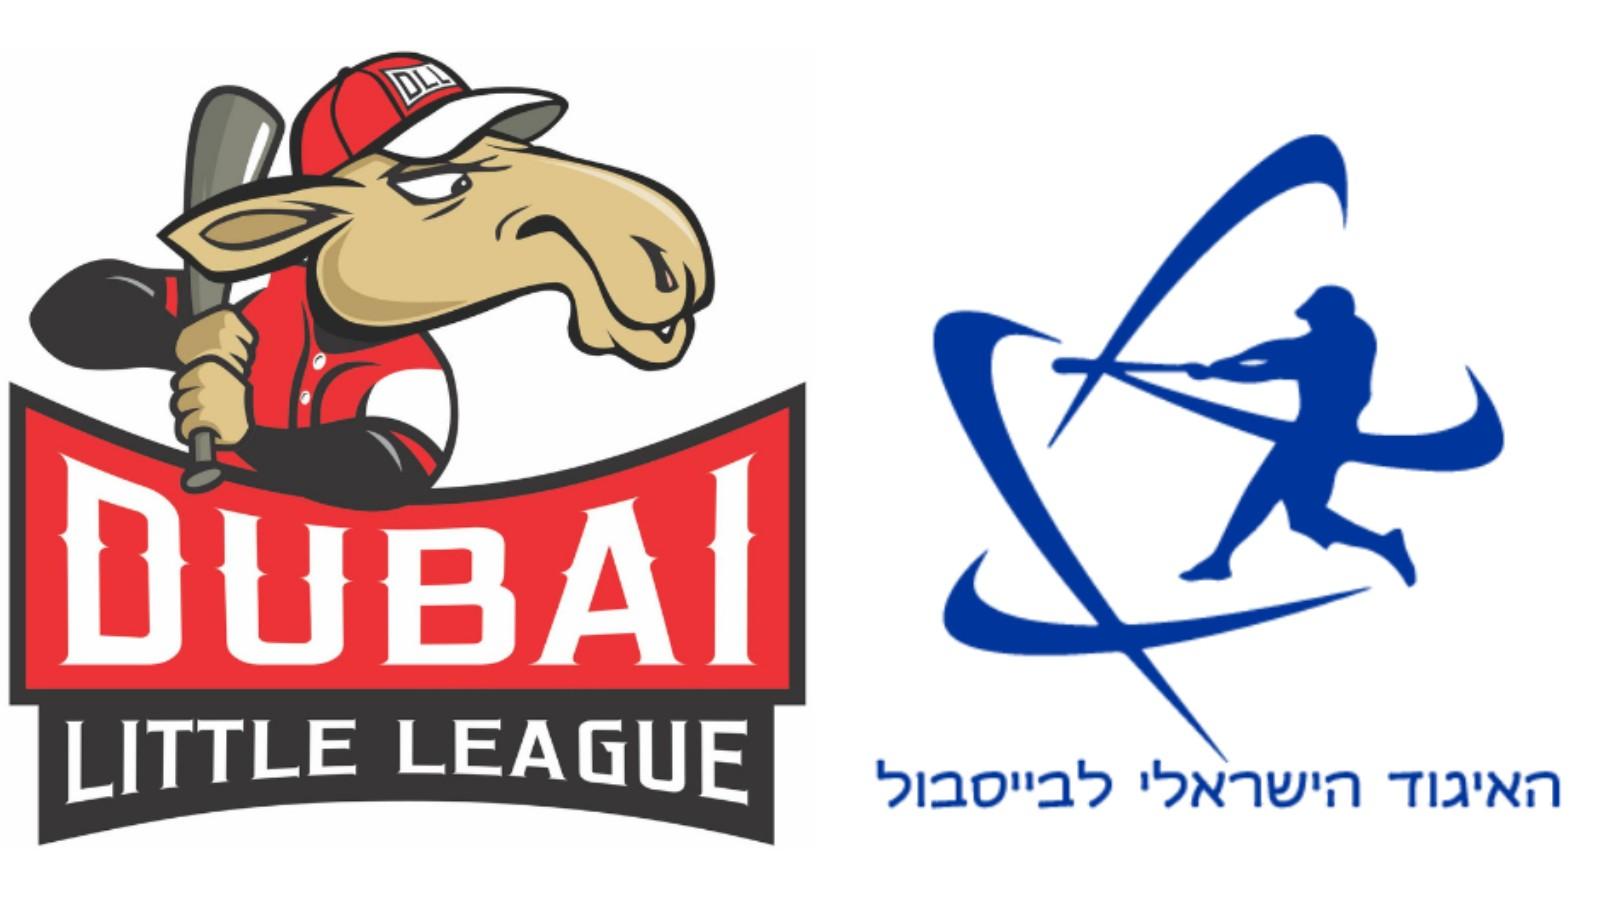 Play Ball! Tournament Brings Israeli, Emirati Kids Together